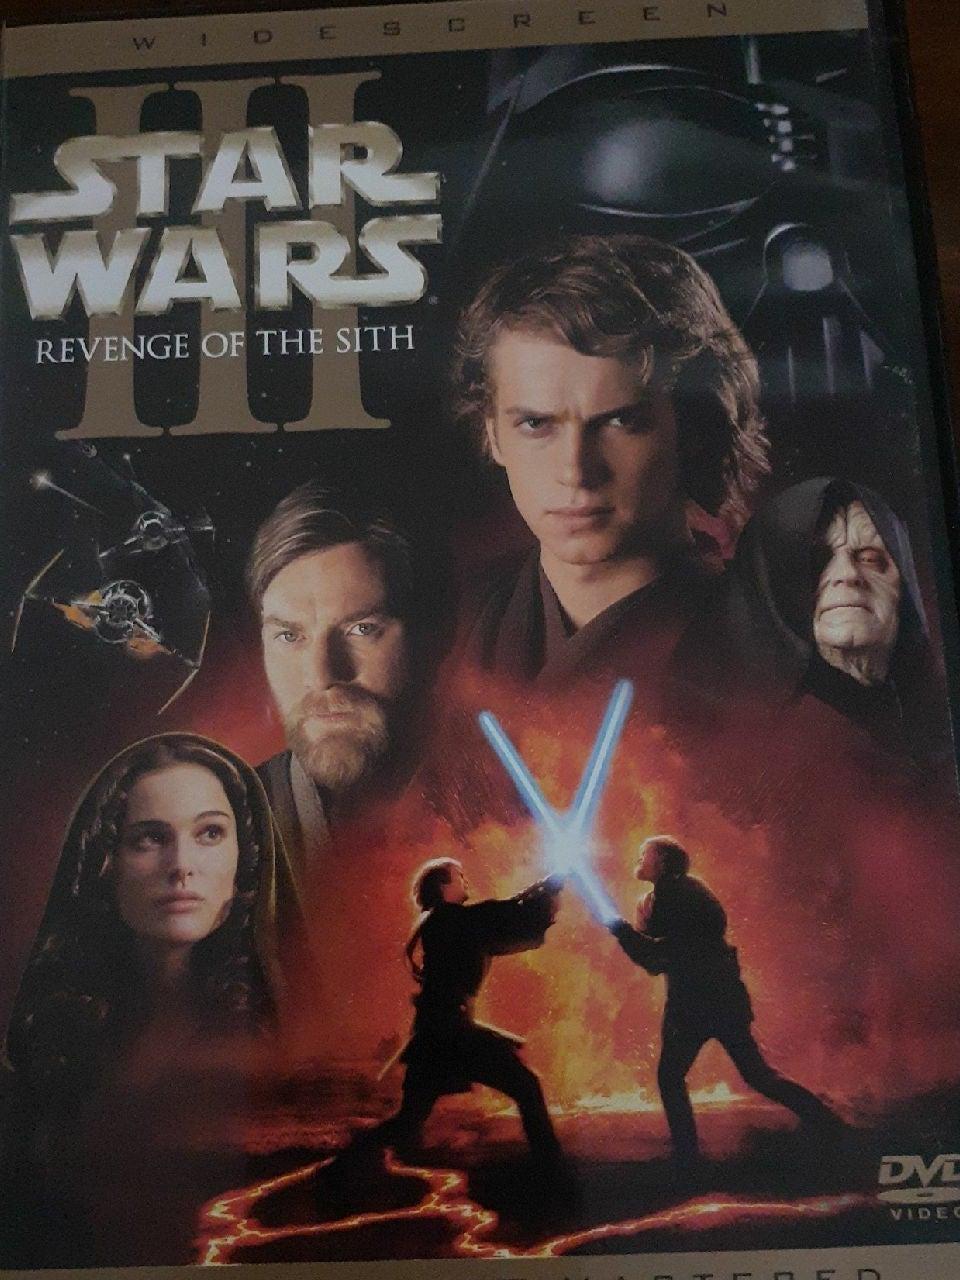 Star Wars Episode III Revenge of the Sit